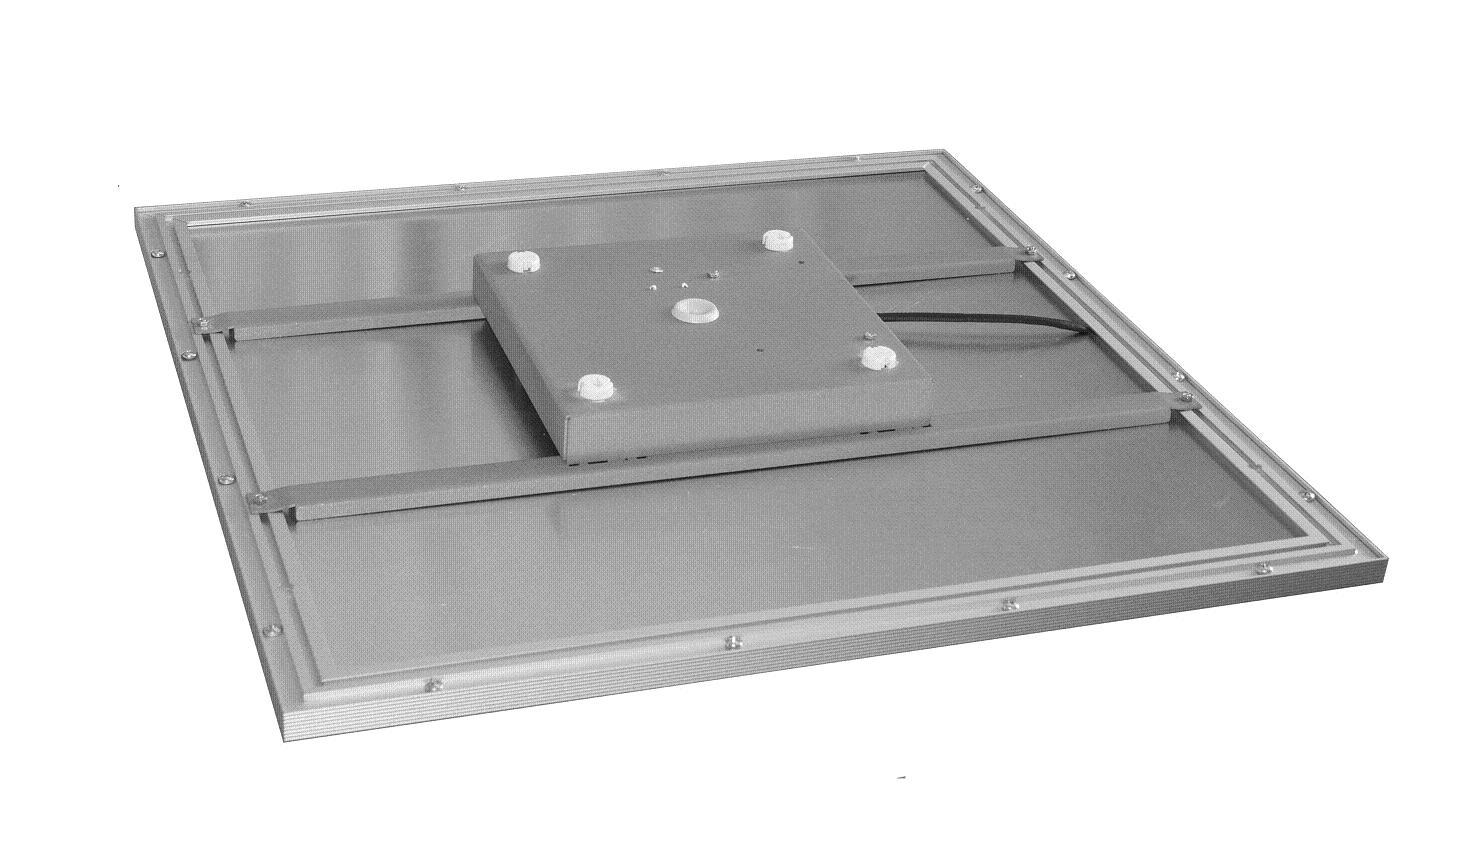 modus qp led panel 55w 5600lm 3800k 625x625 bestellen. Black Bedroom Furniture Sets. Home Design Ideas